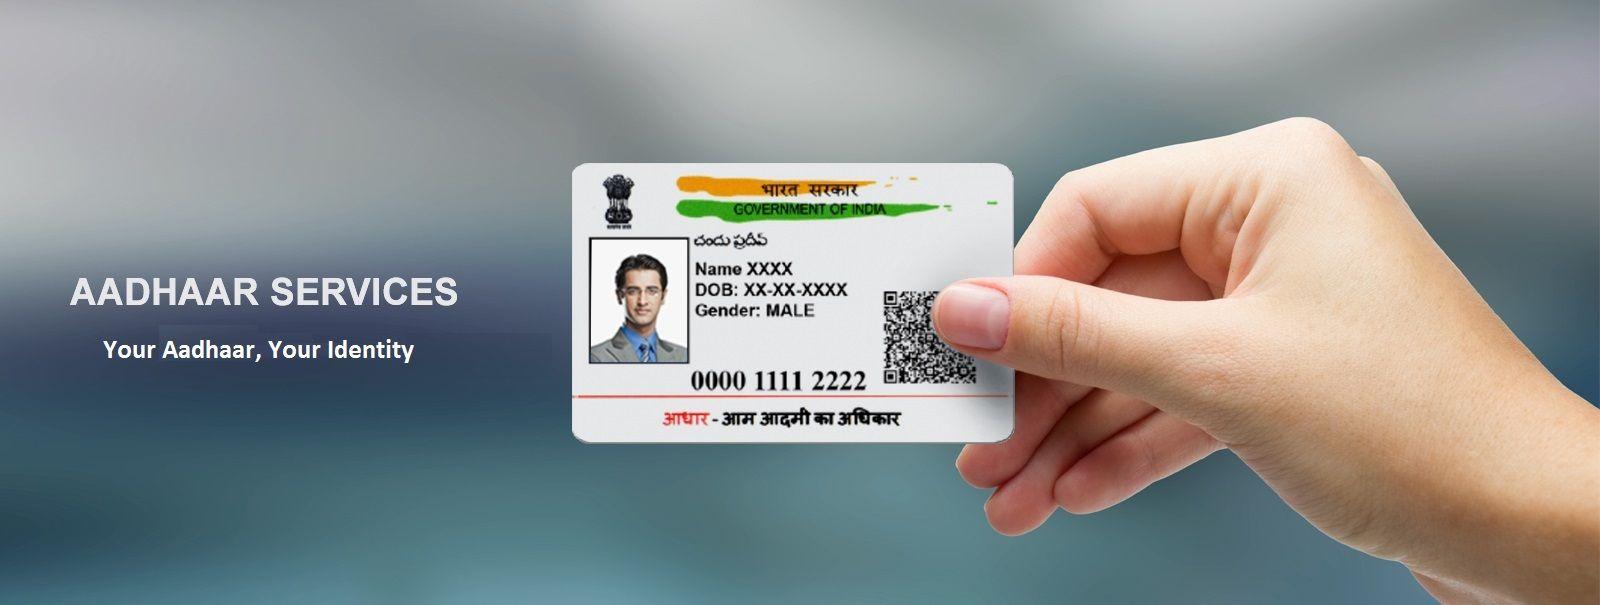 Aadhar Card List Name In 2021 Aadhar Card Cards Names